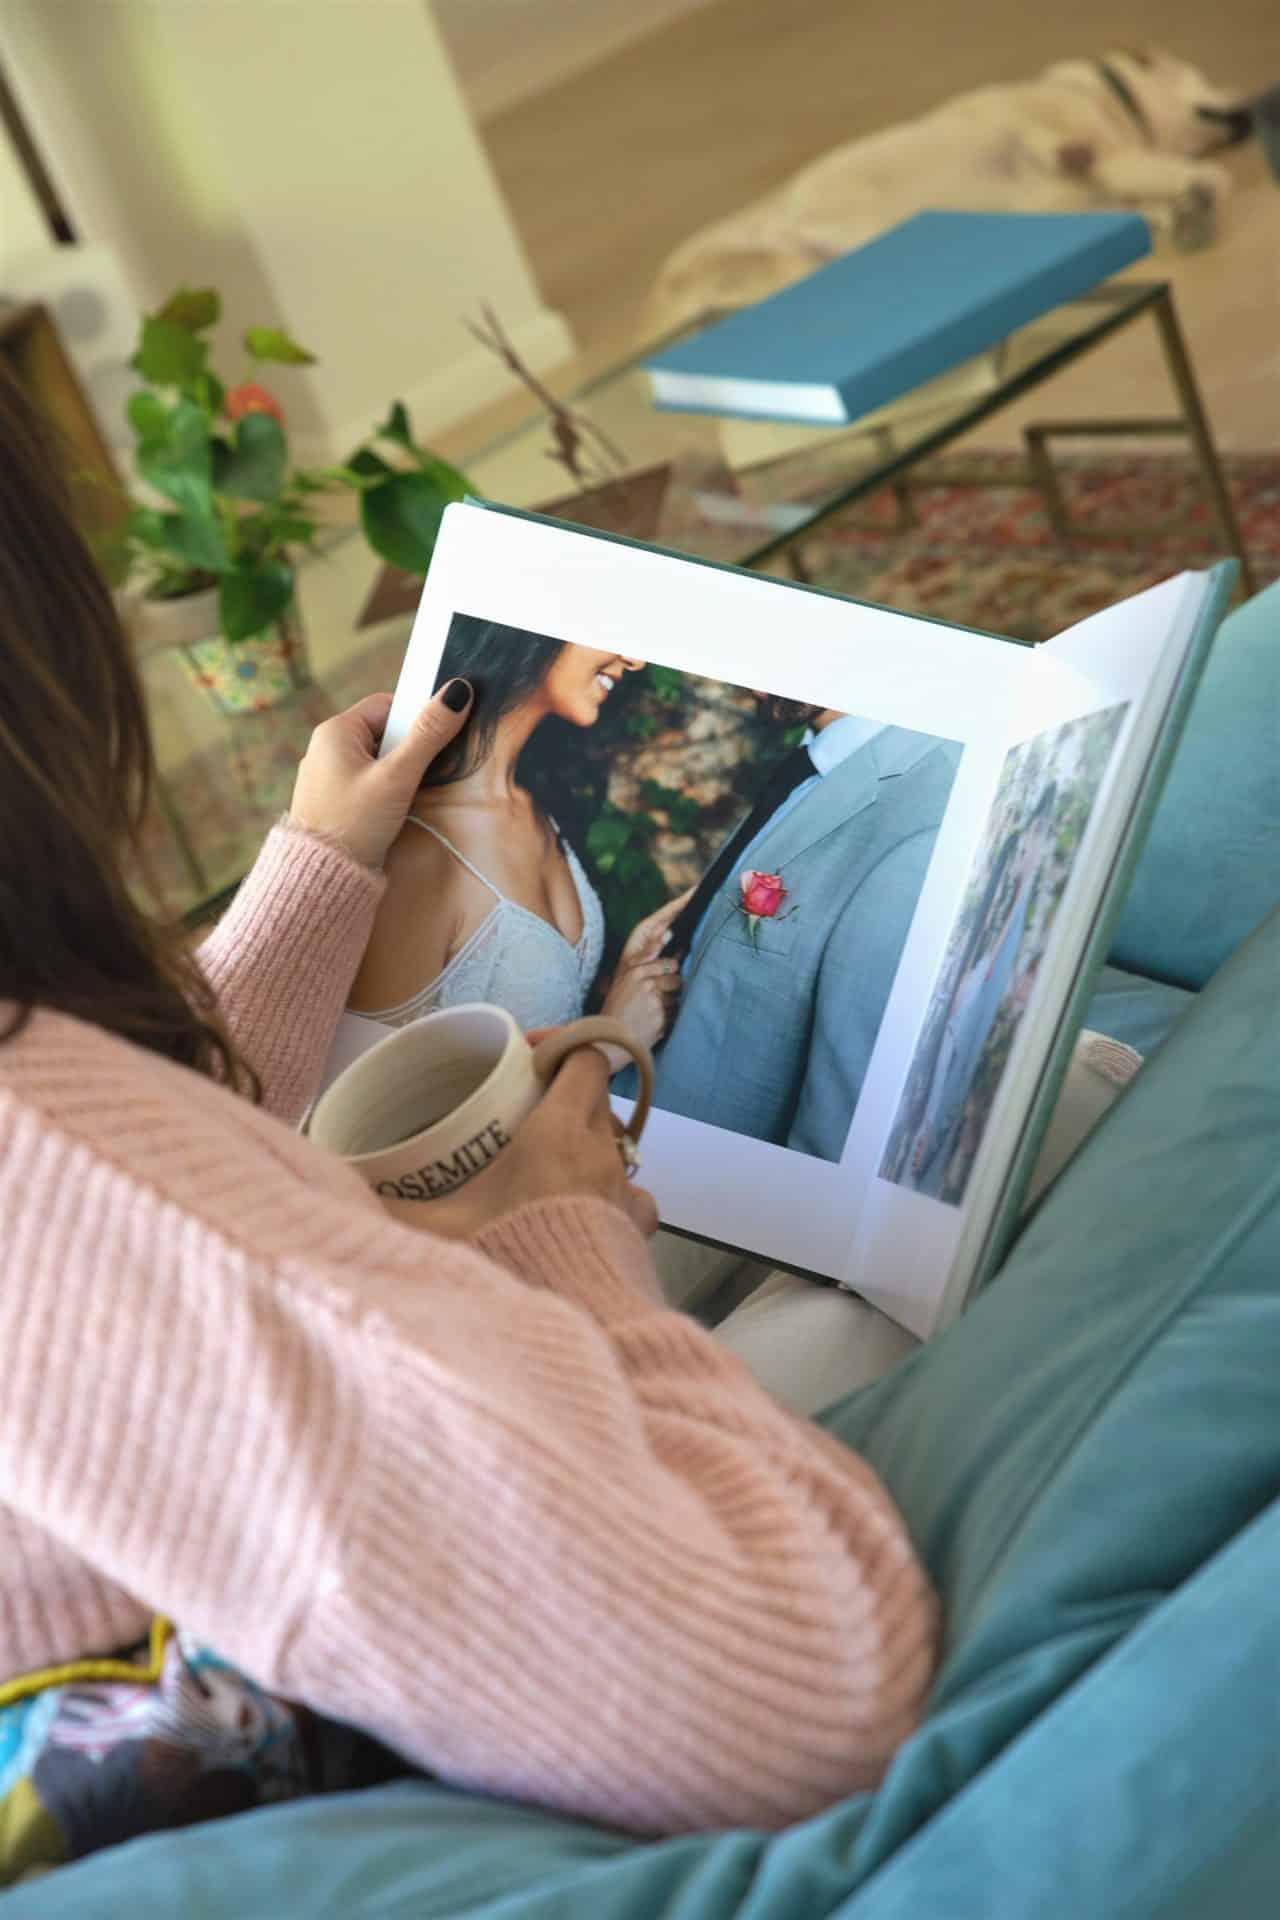 Albums Of Love - מסתכלים על אלבום חתונה